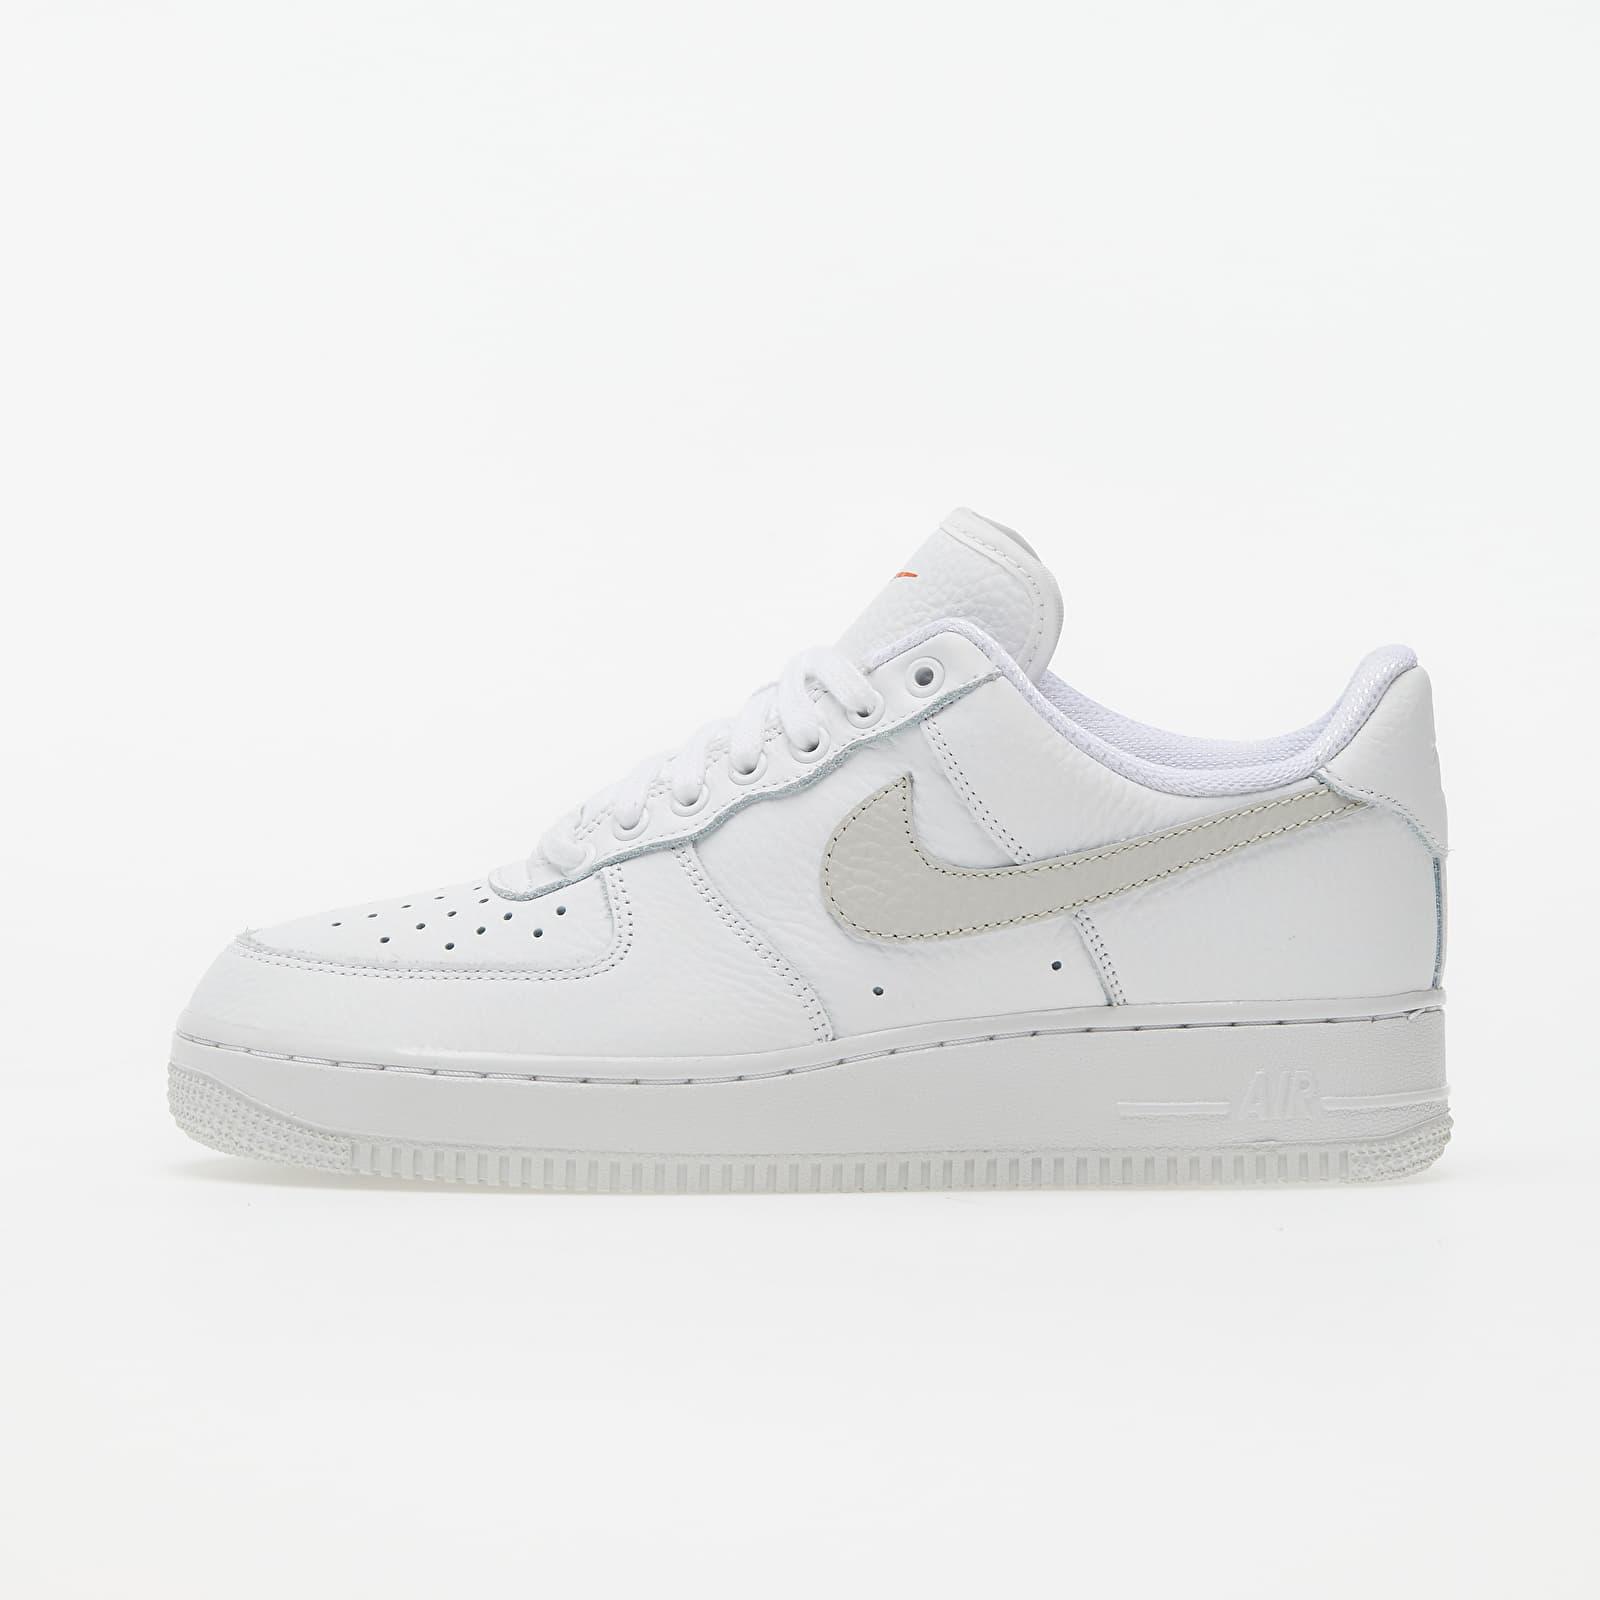 Nike Wmns Air Force 1 '07 Summit White/ White-Solar Flare-Starfish EUR 36